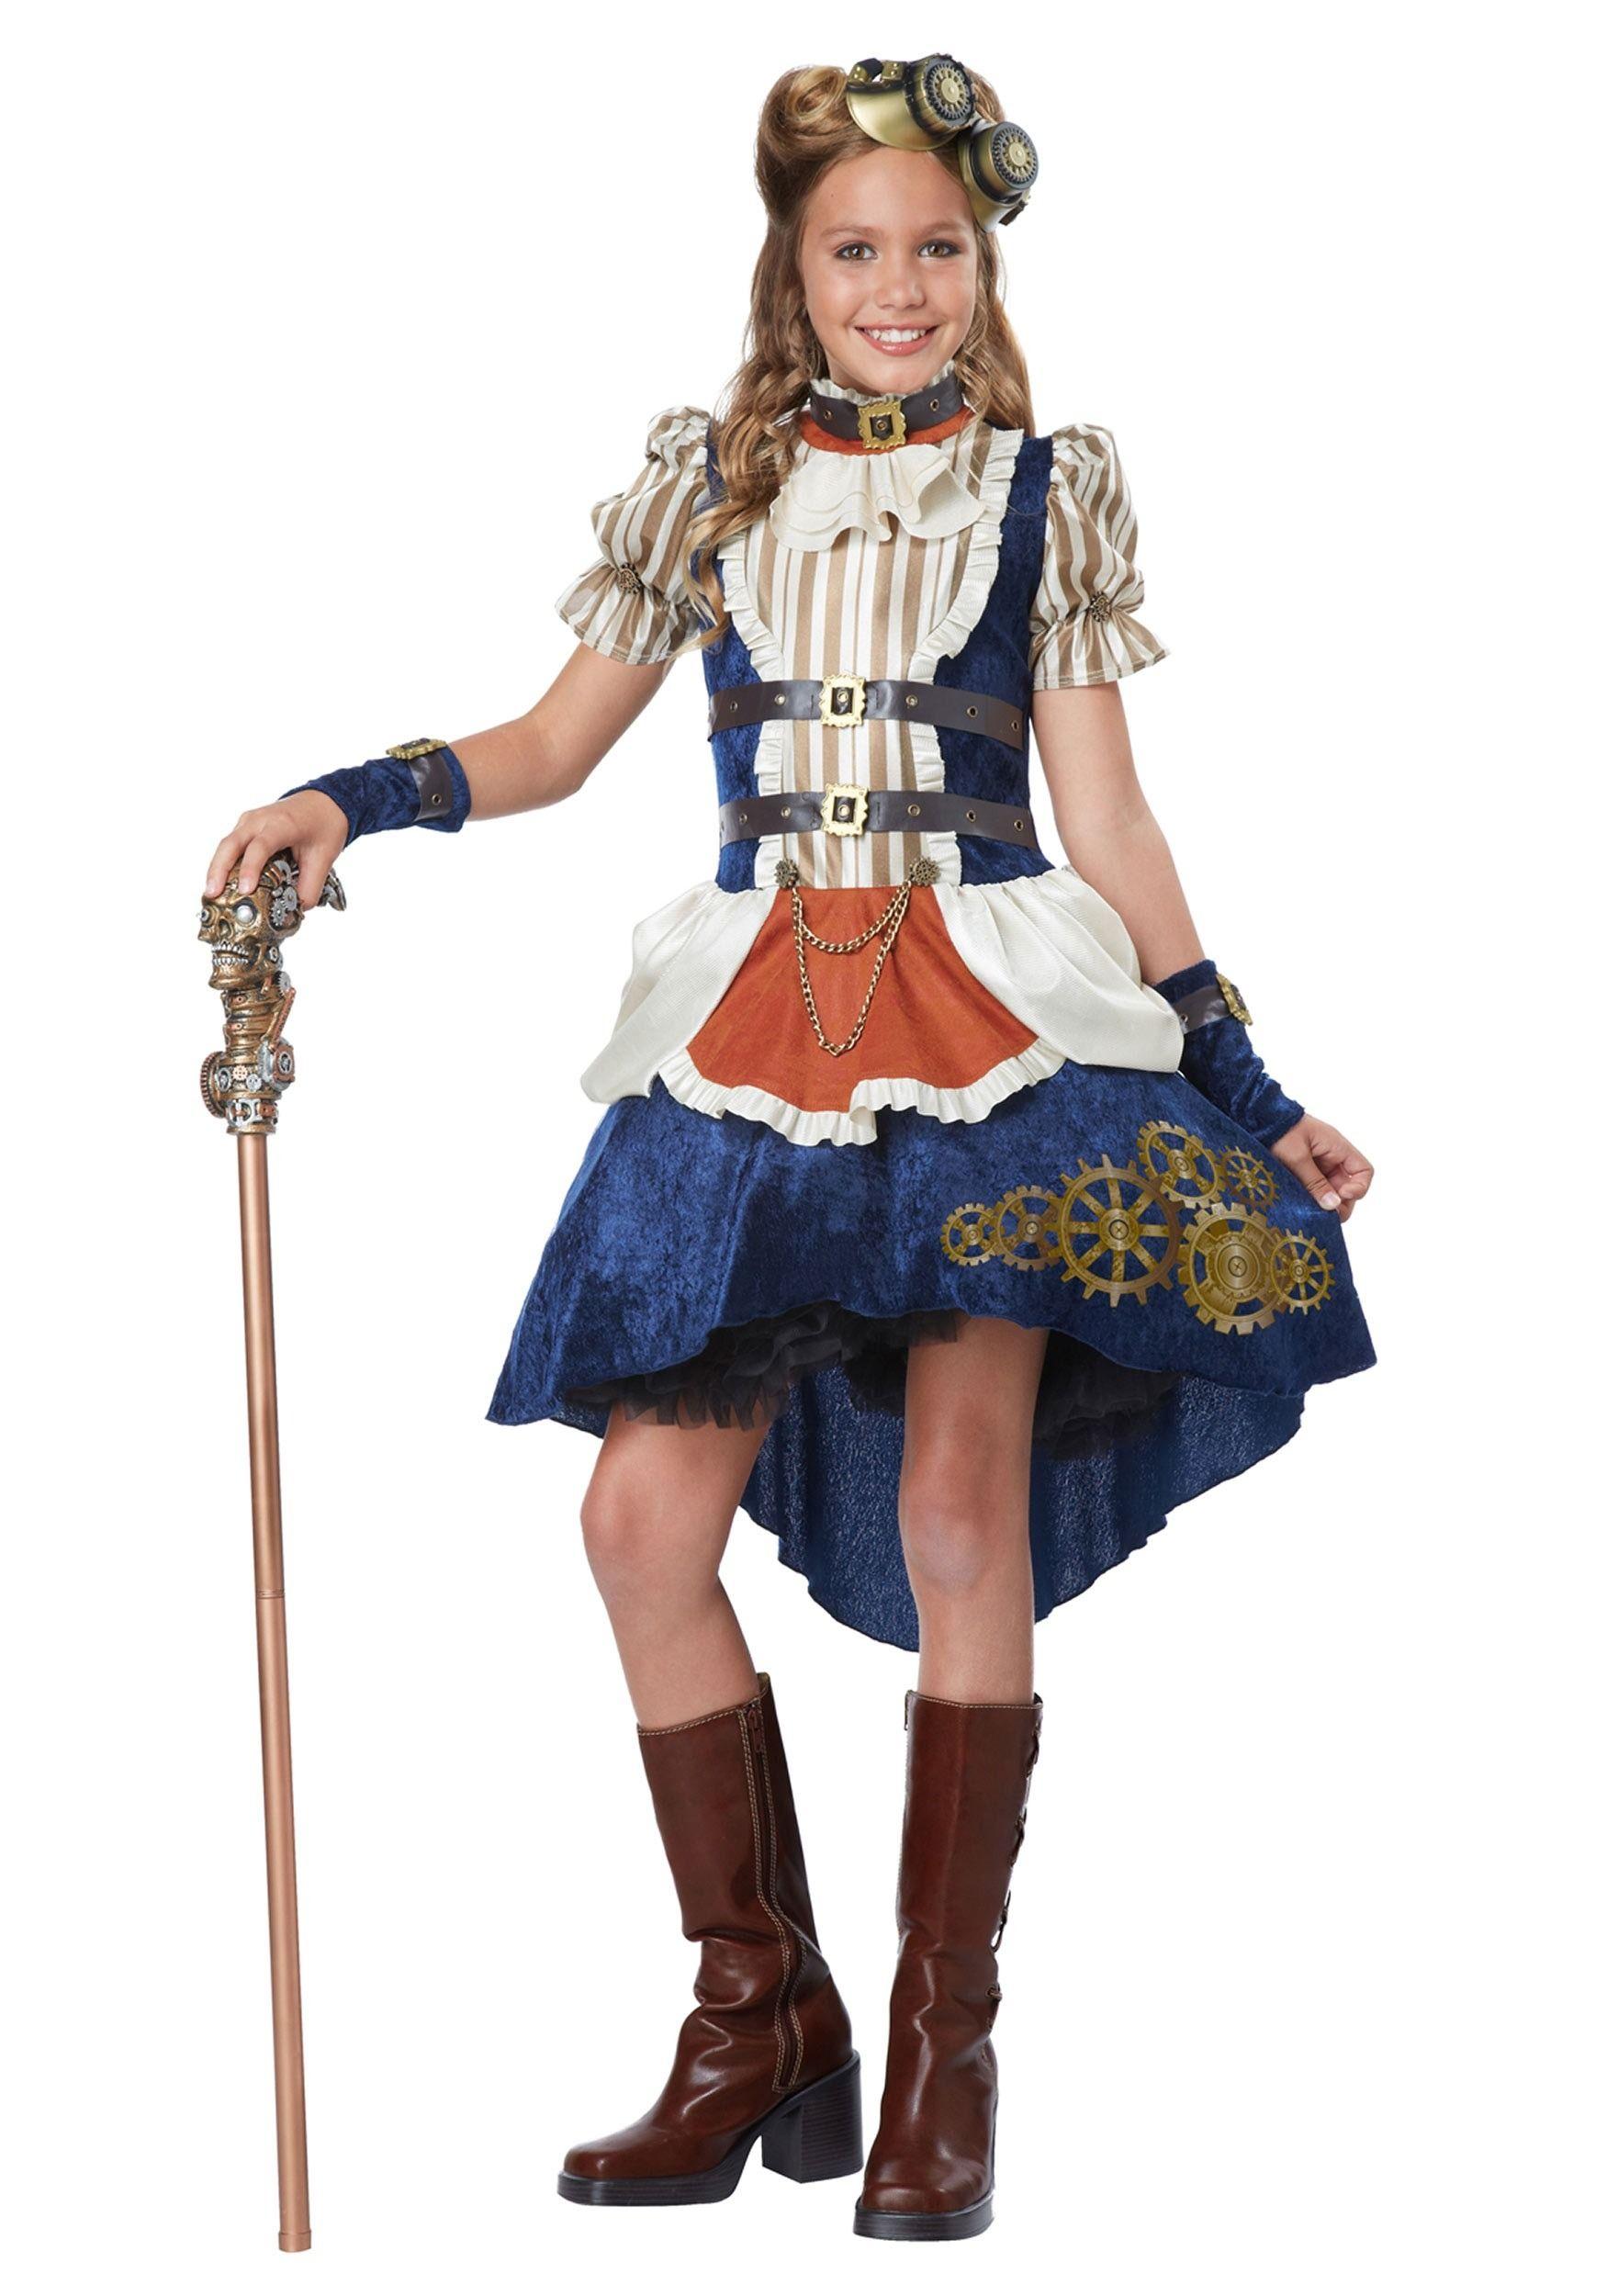 Steampunk Costumes - Victorian Steampunk Fashion Costumes ...